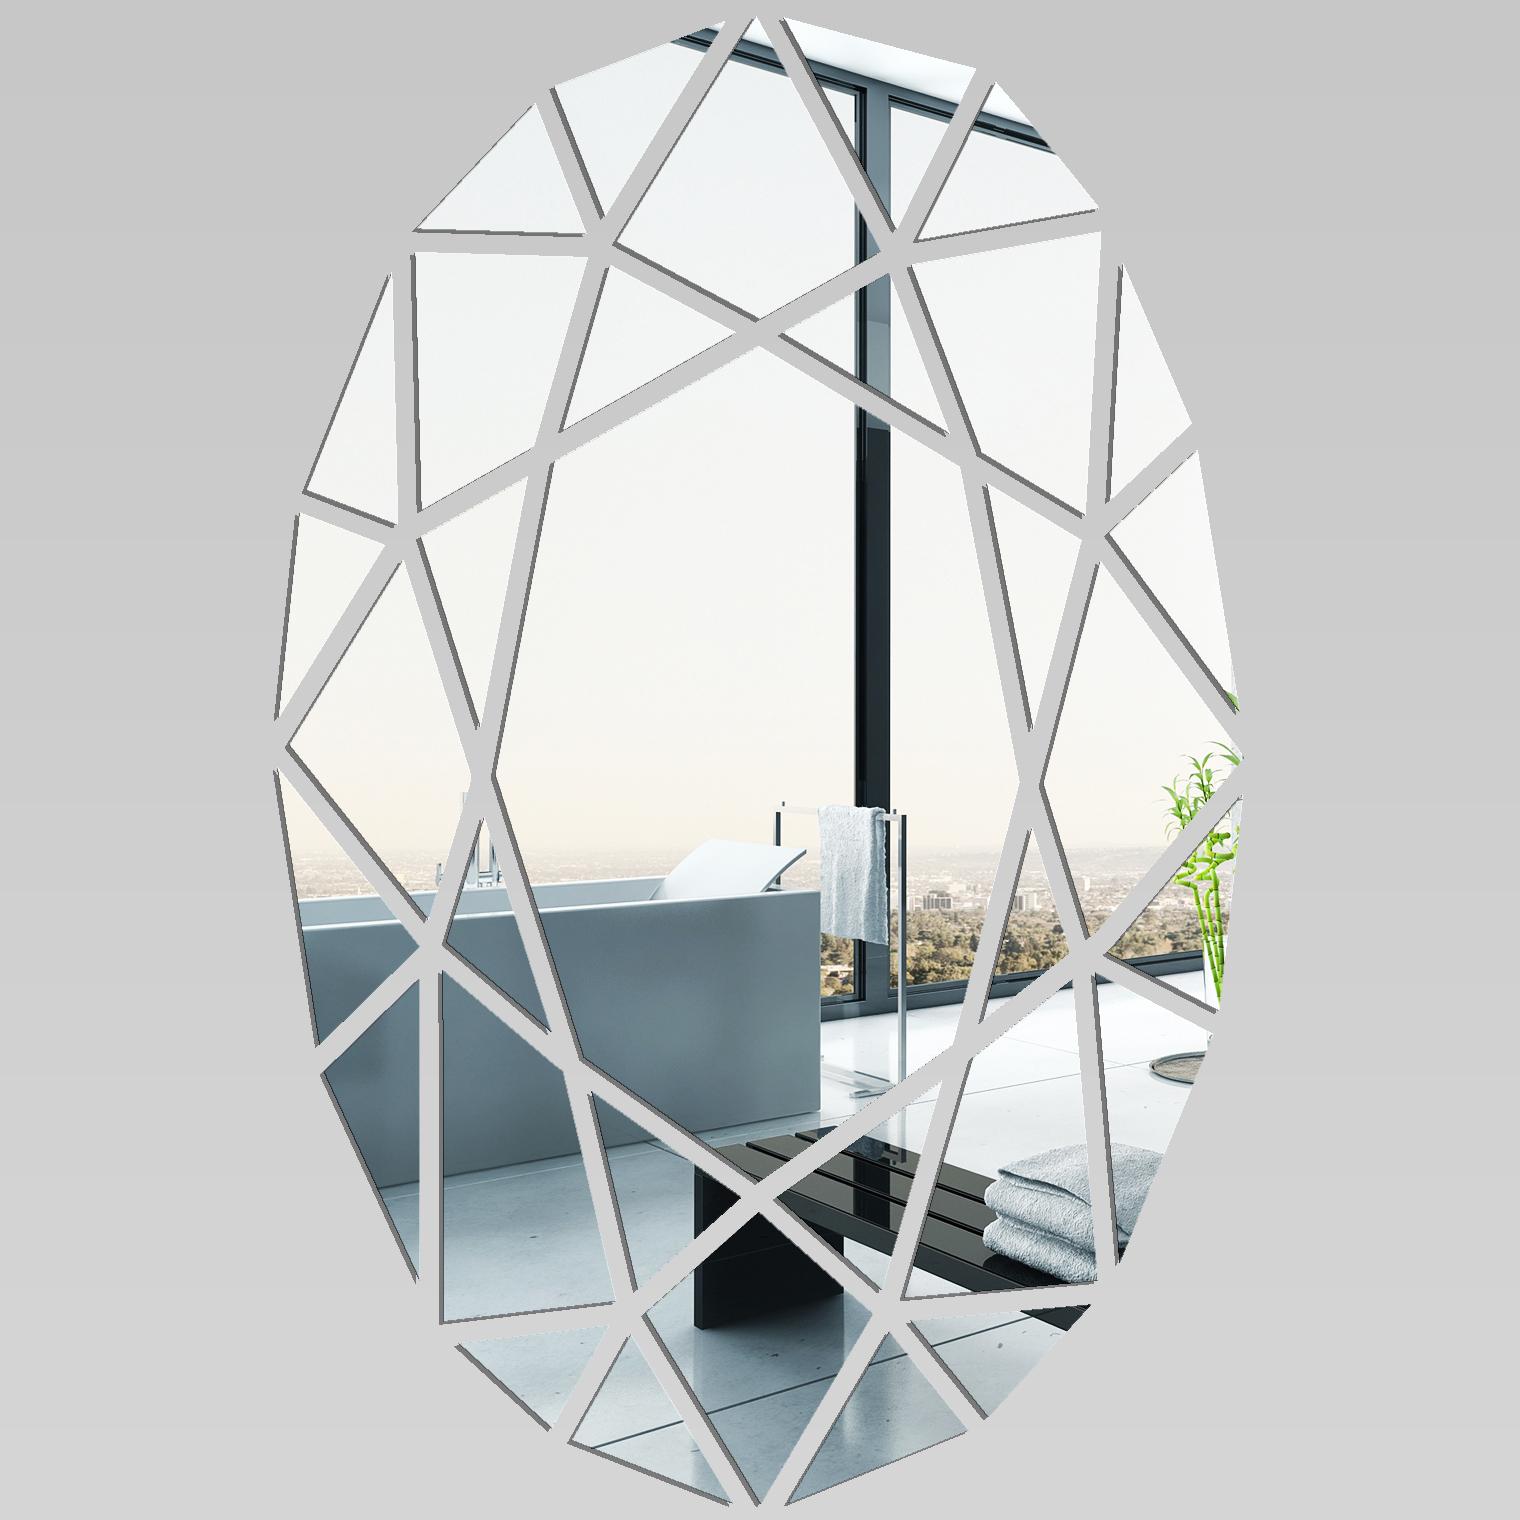 Vinilos folies espejos decorativo acr lico pl xiglas mosaico for Papier autocollant miroir